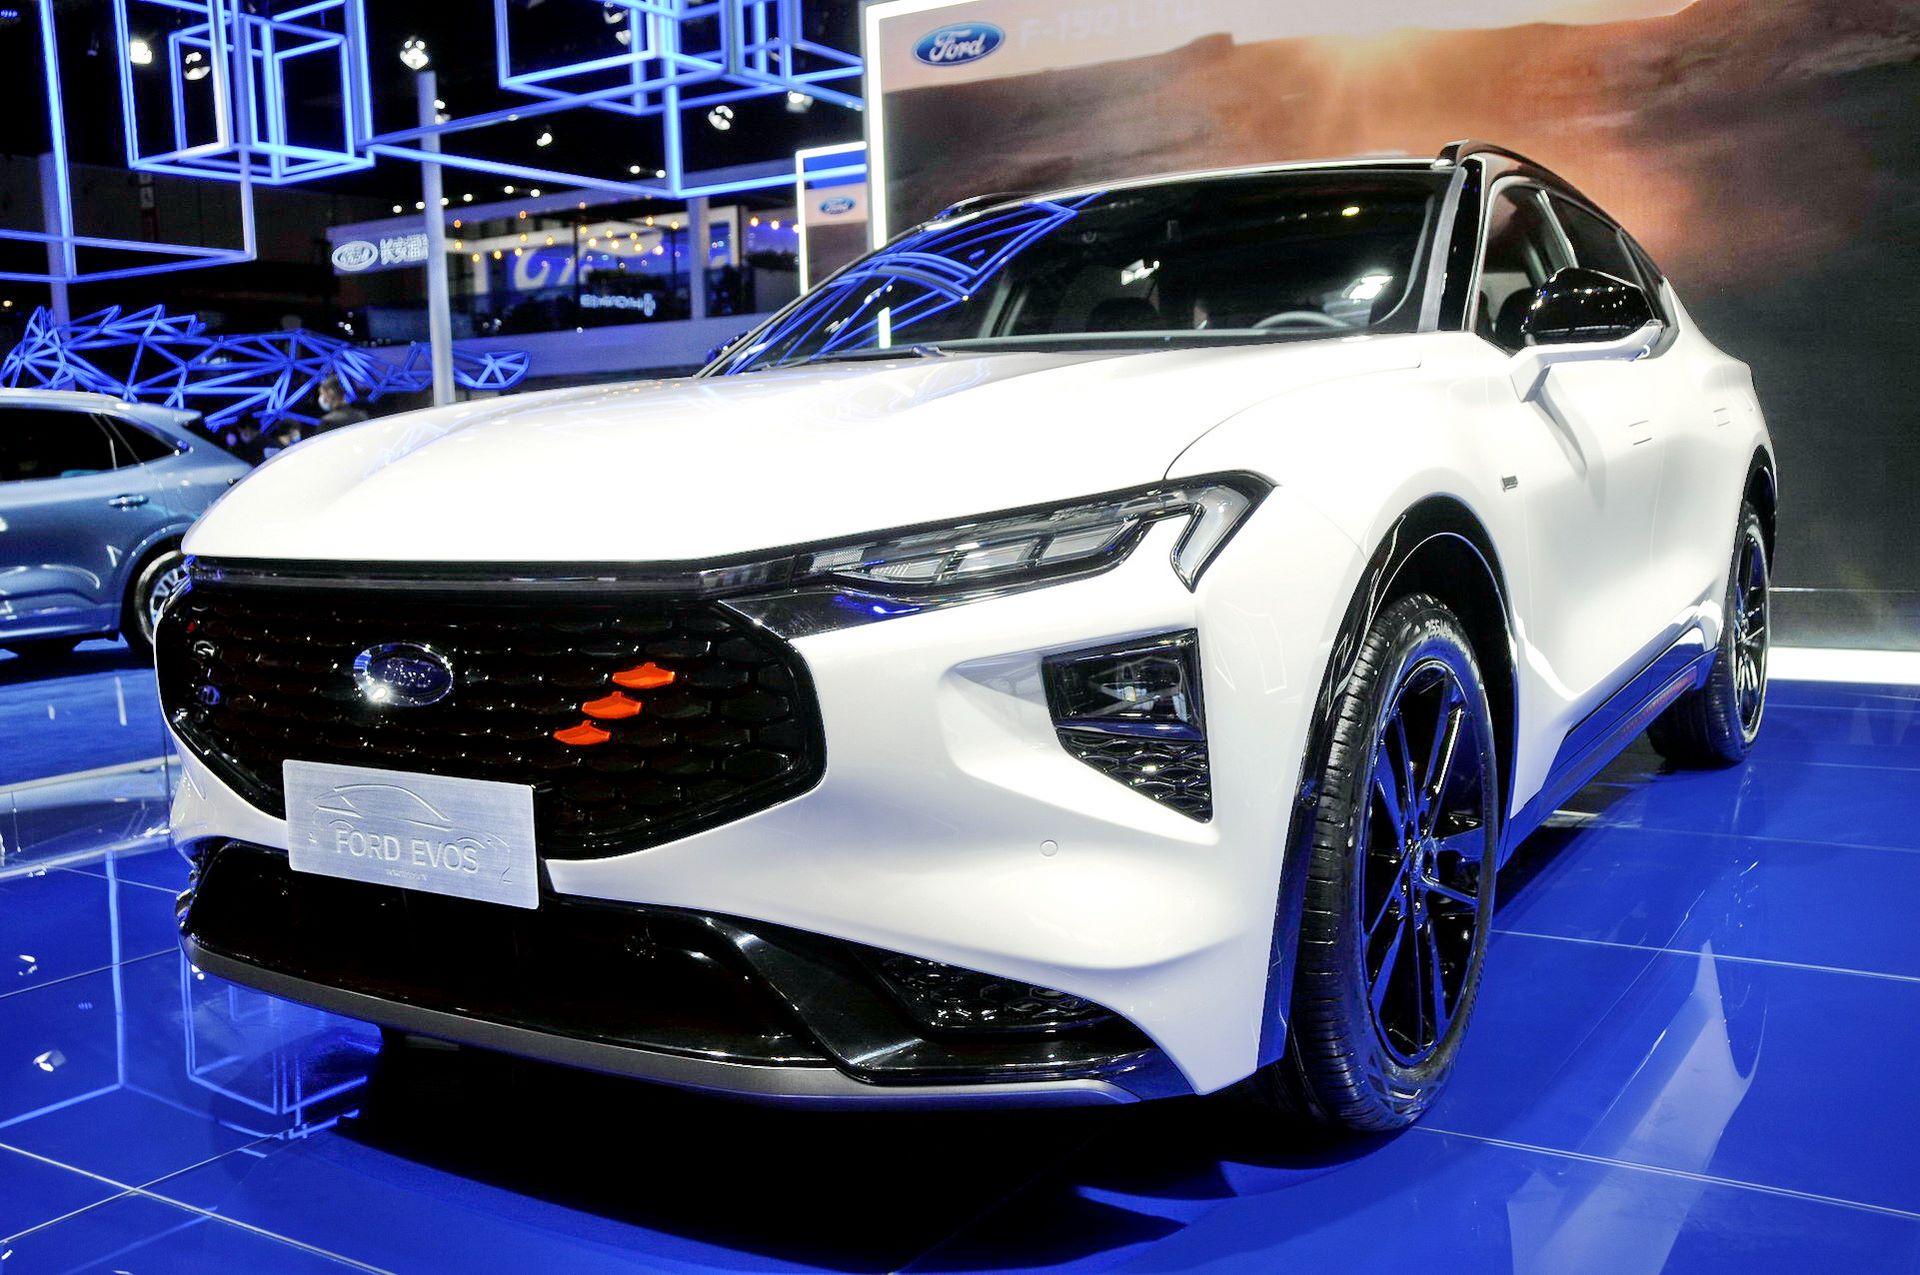 Ford-Evos-2021-4